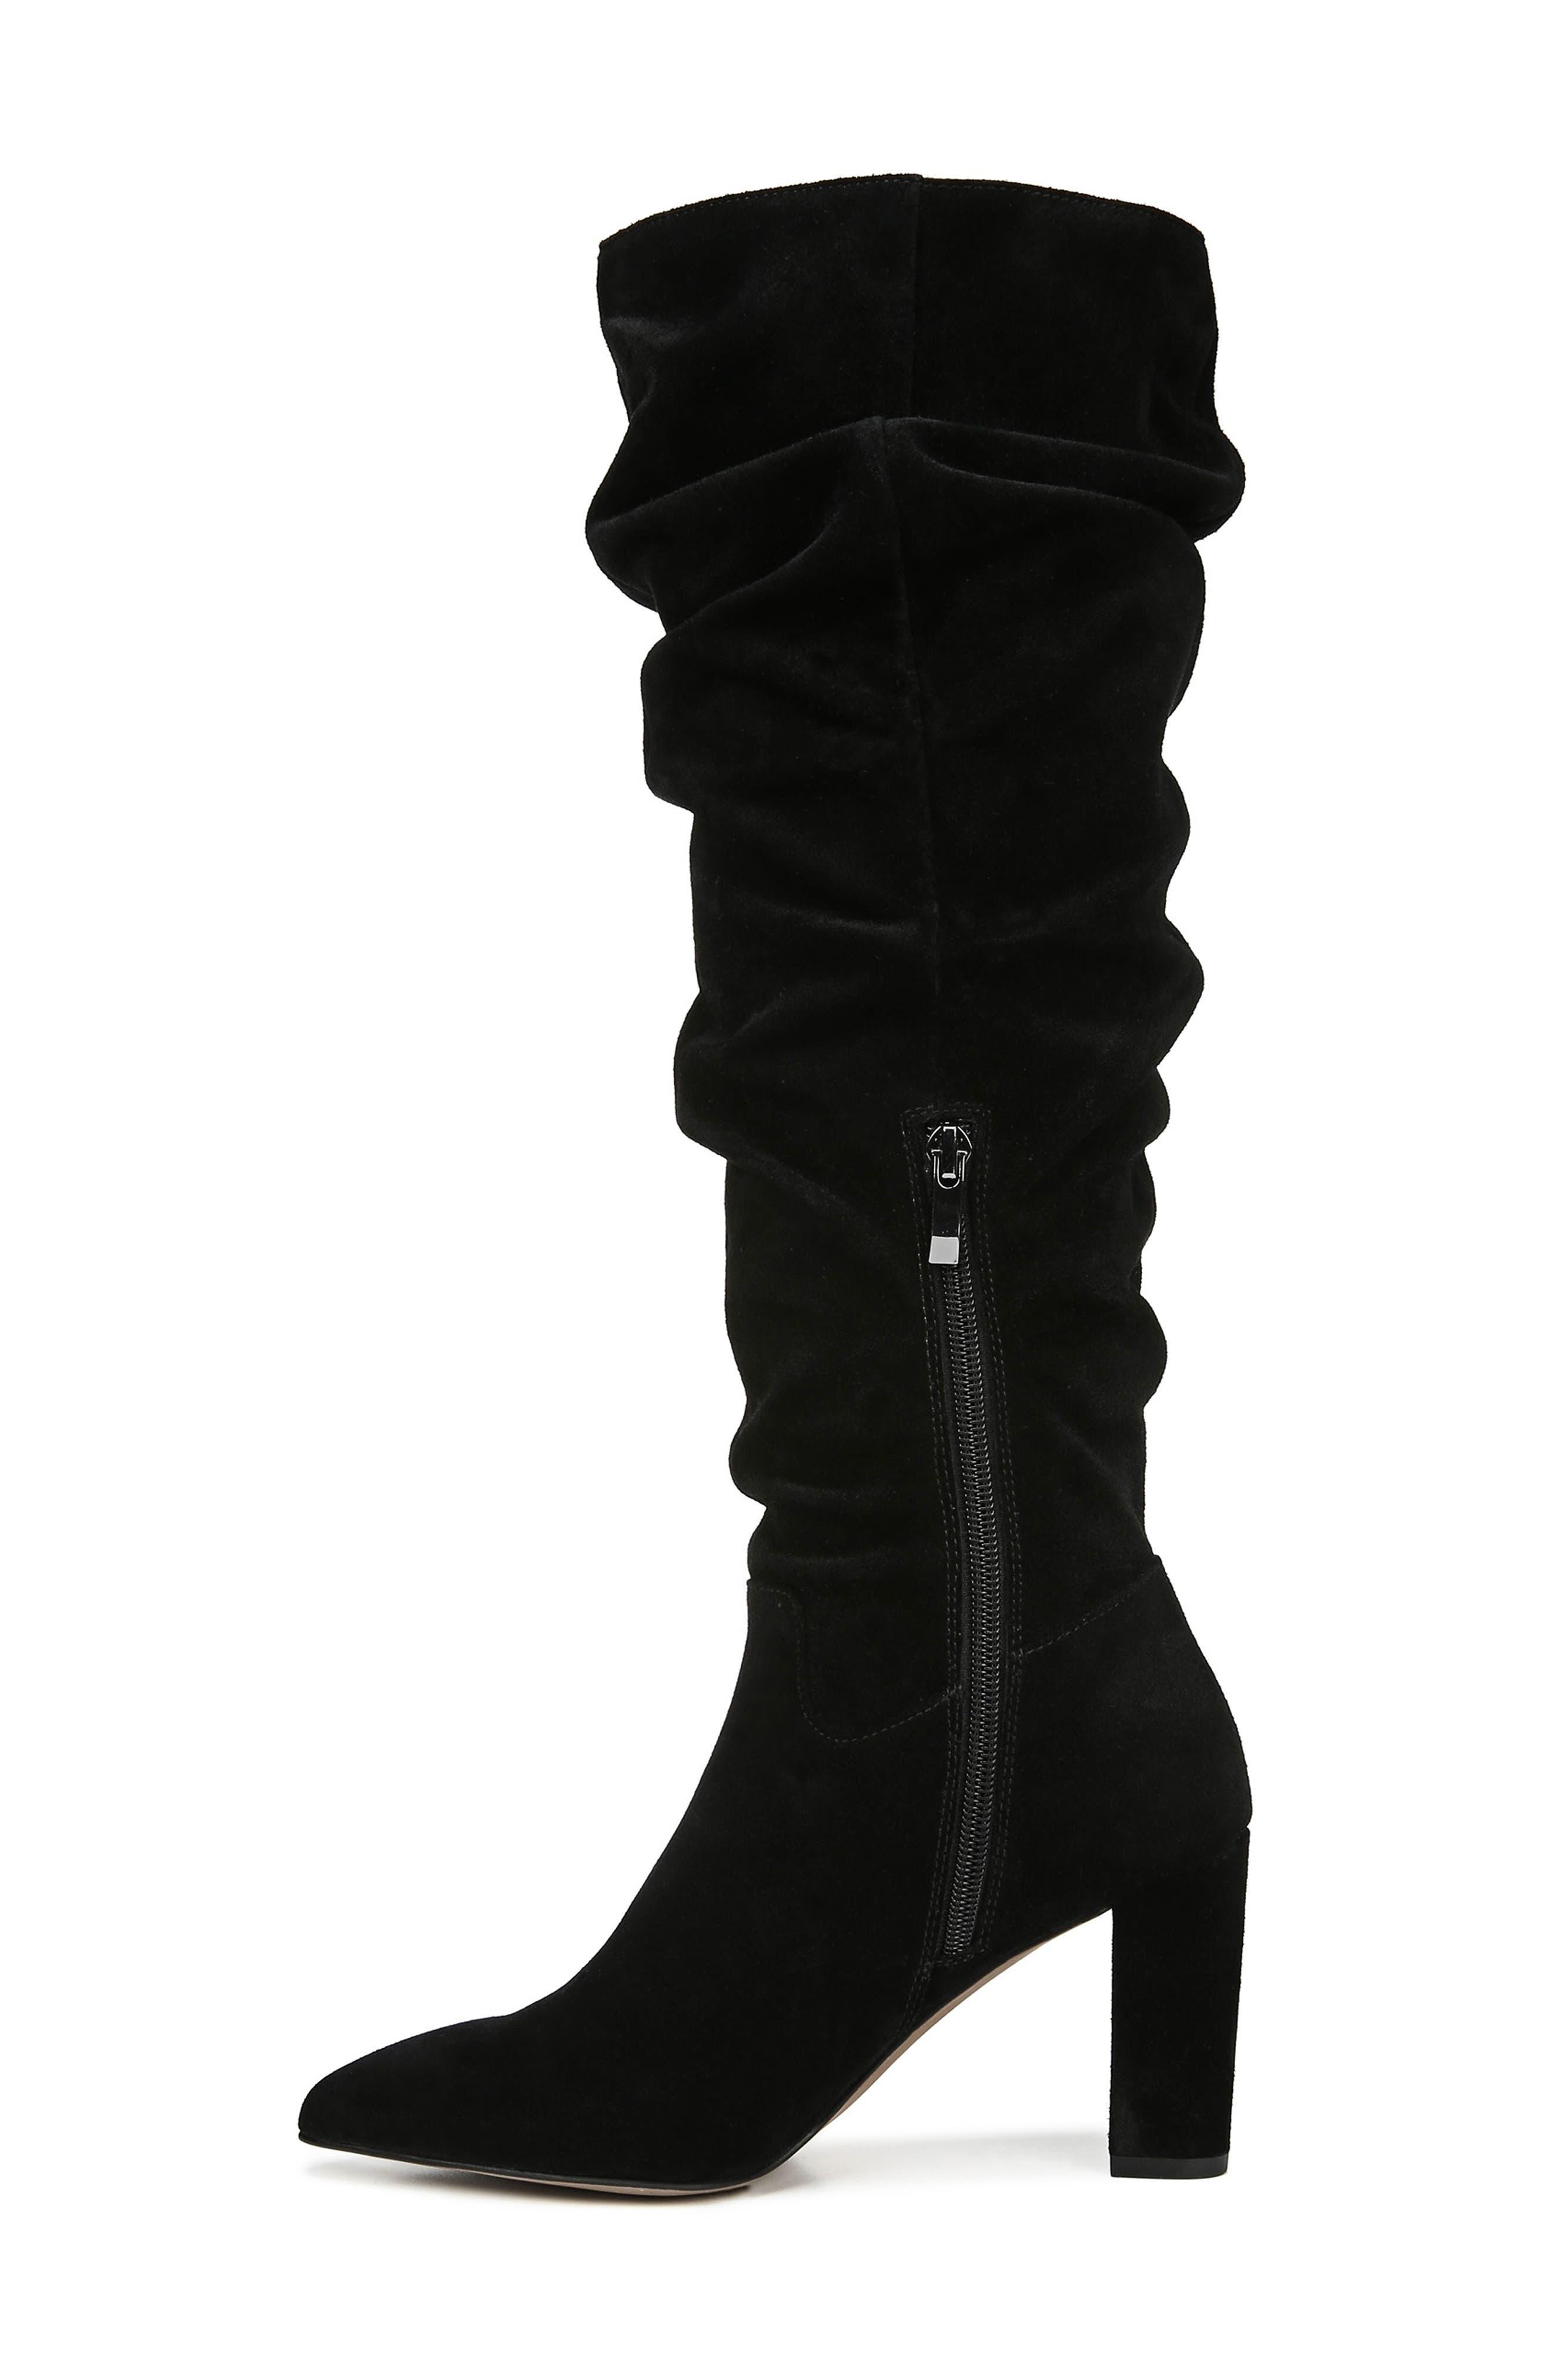 Artesia Knee High Boot,                             Alternate thumbnail 9, color,                             BLACK SUEDE